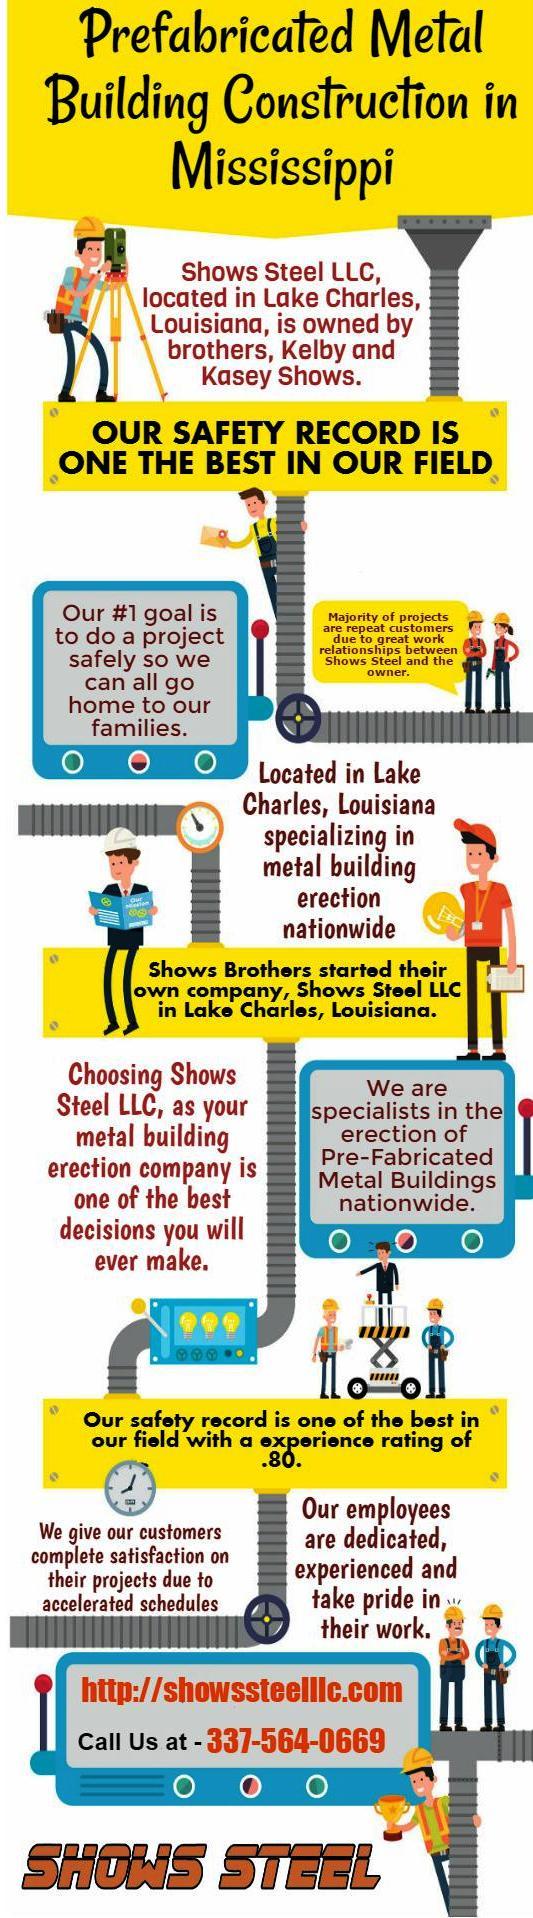 Prefabricated Steel & Metal Building Company in